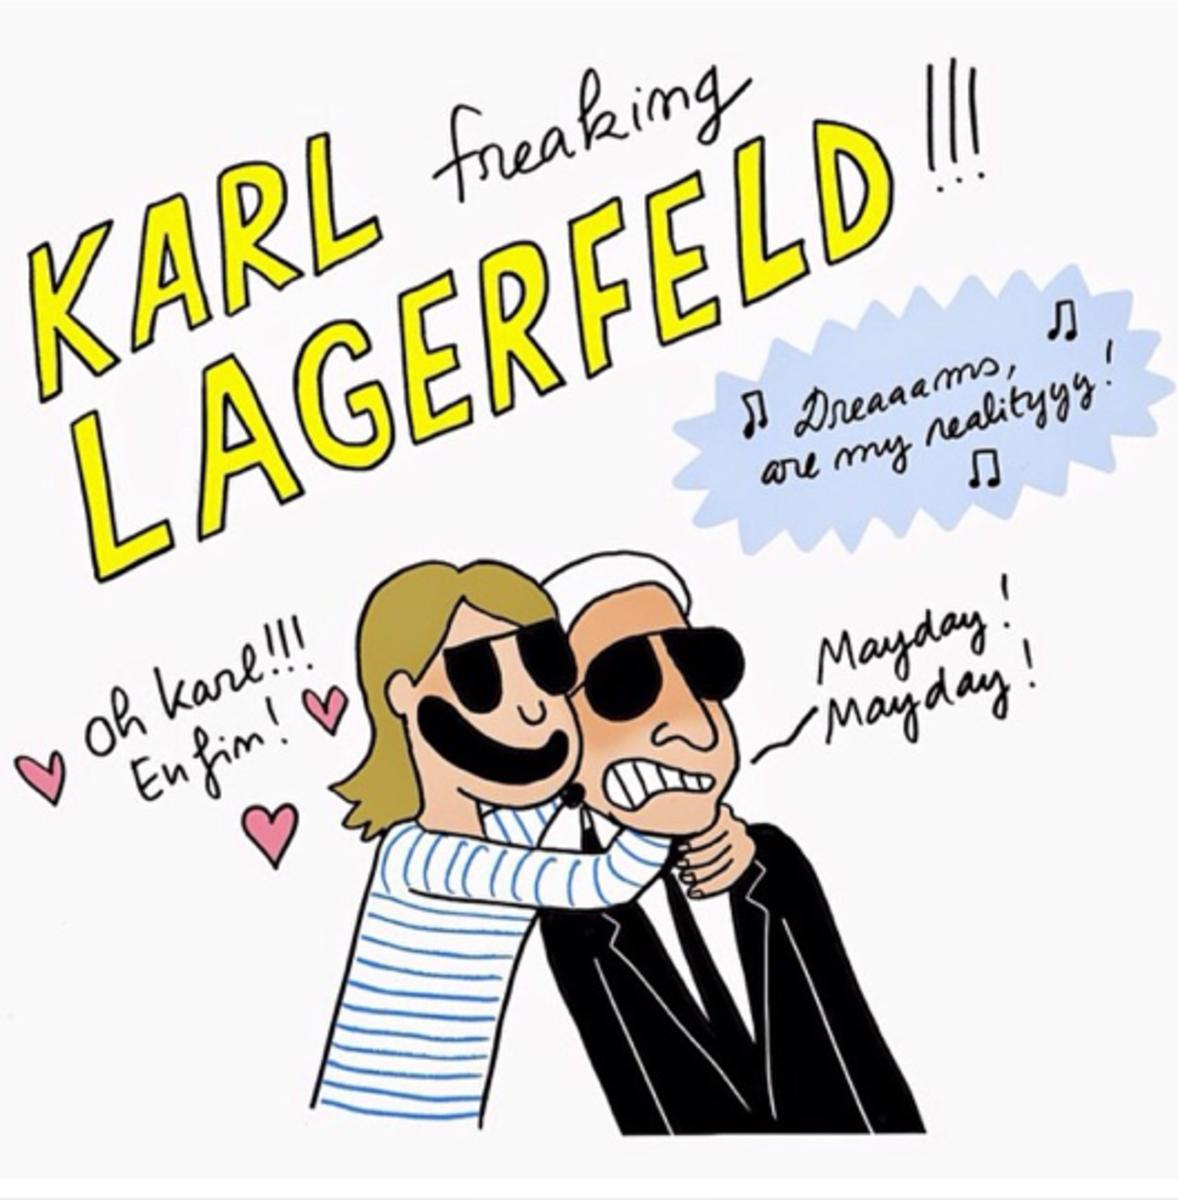 Karl Lagerfeld. Photo: Instagram/@karllagerfeld